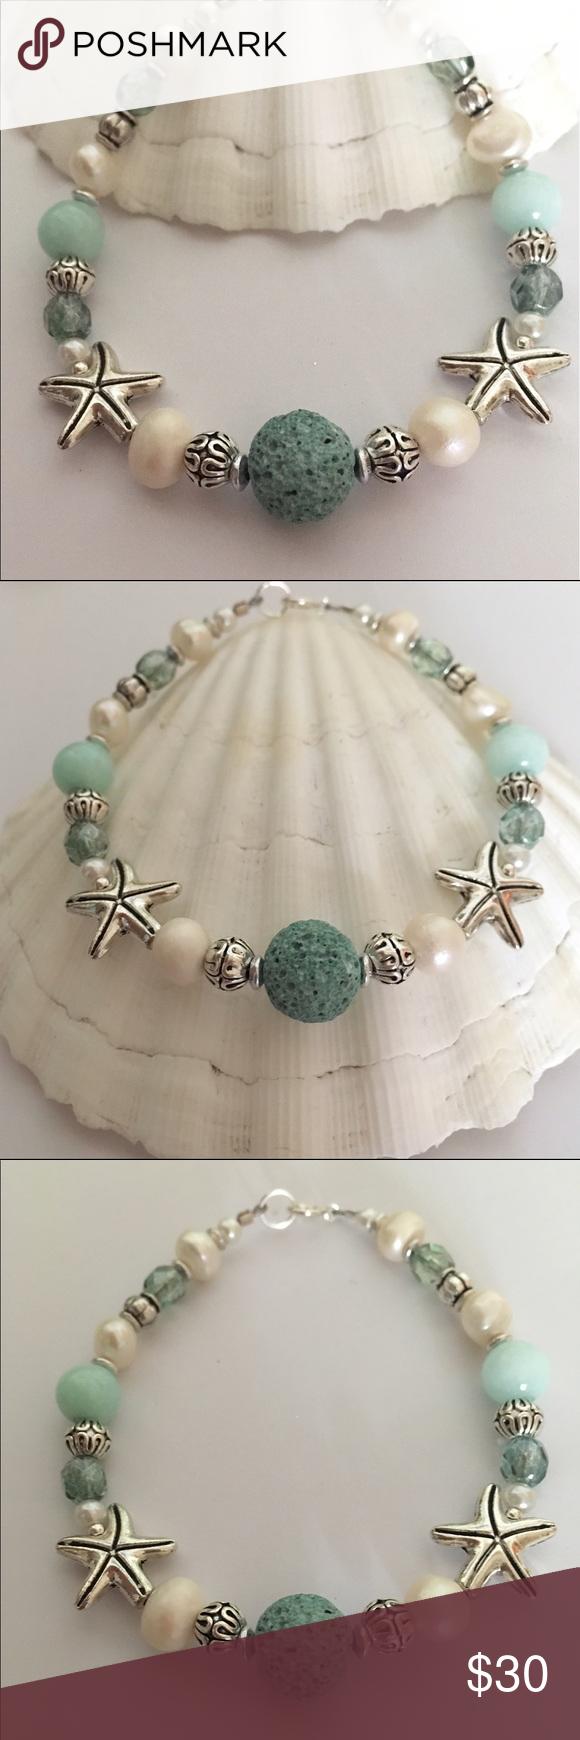 Essential Oil Beach Bracelet Gorgeous